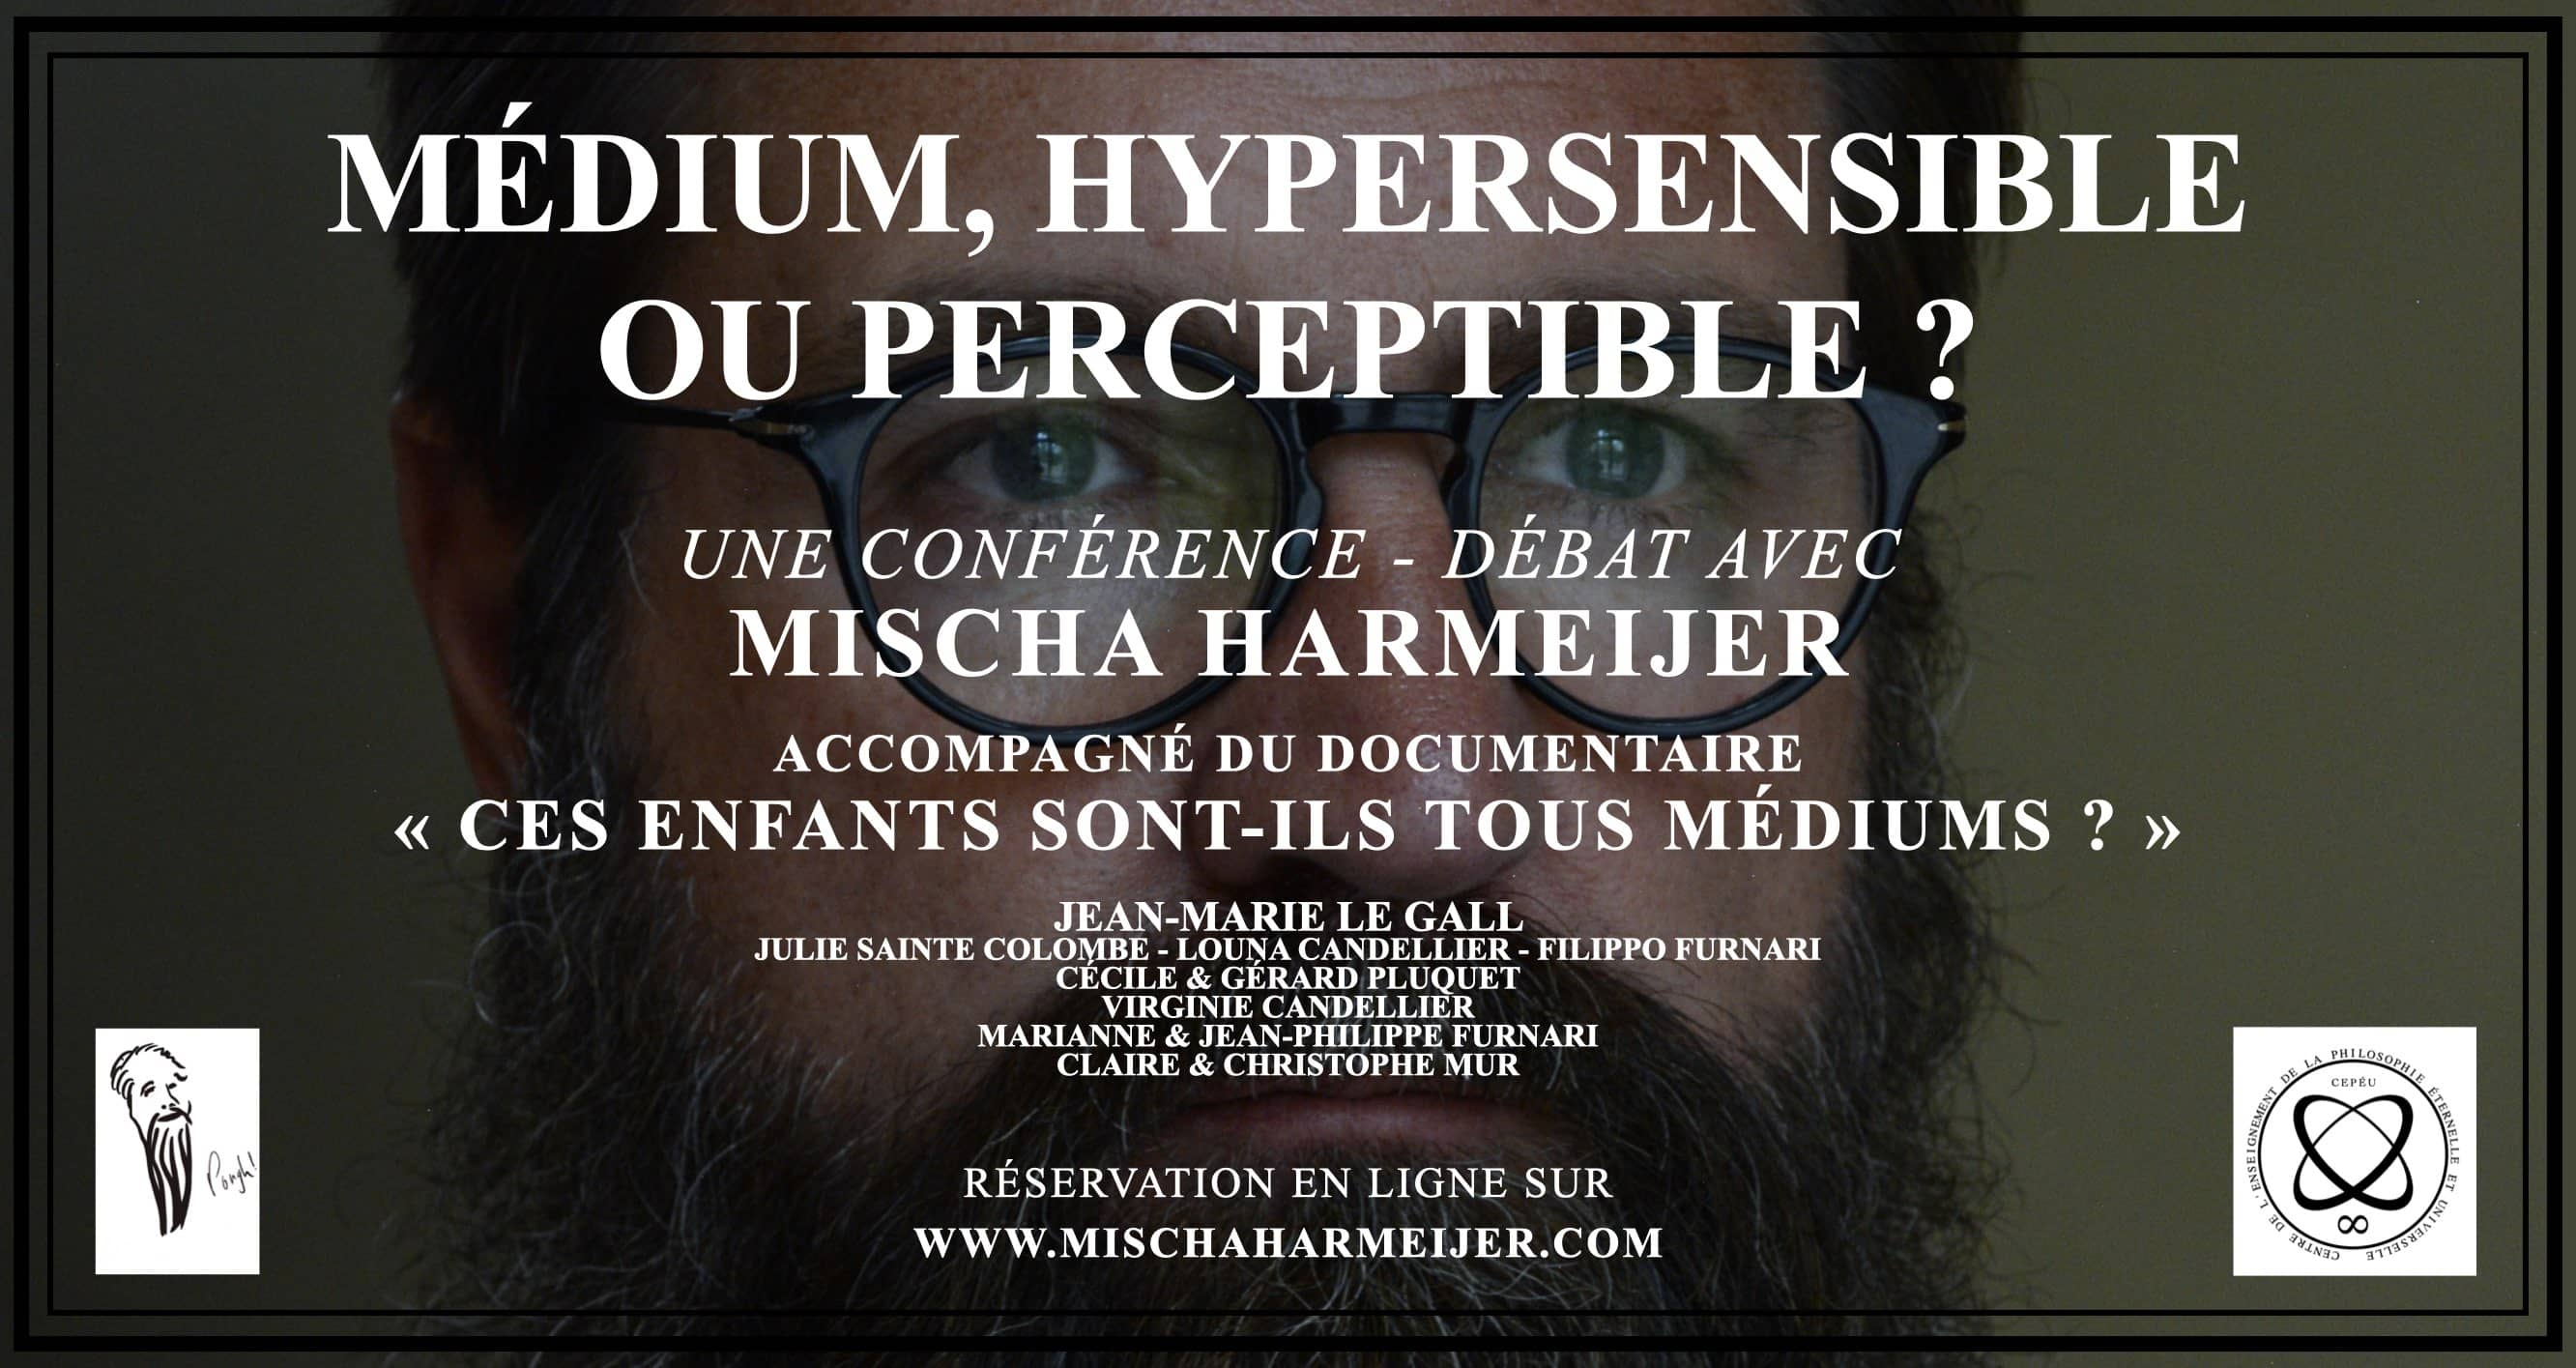 MEDIUM_HYPERSENSIBLE-OU-PERCEPTIBLE_AFFICHE-EVENEMENT.001